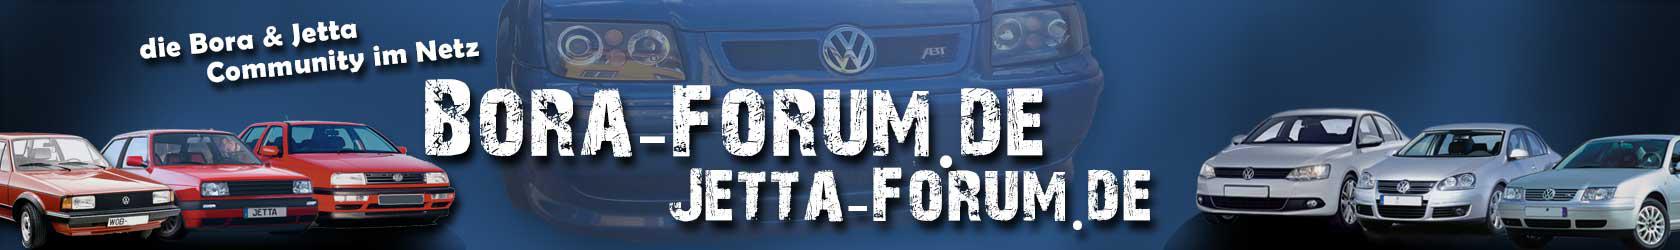 Das globale Bora Forum